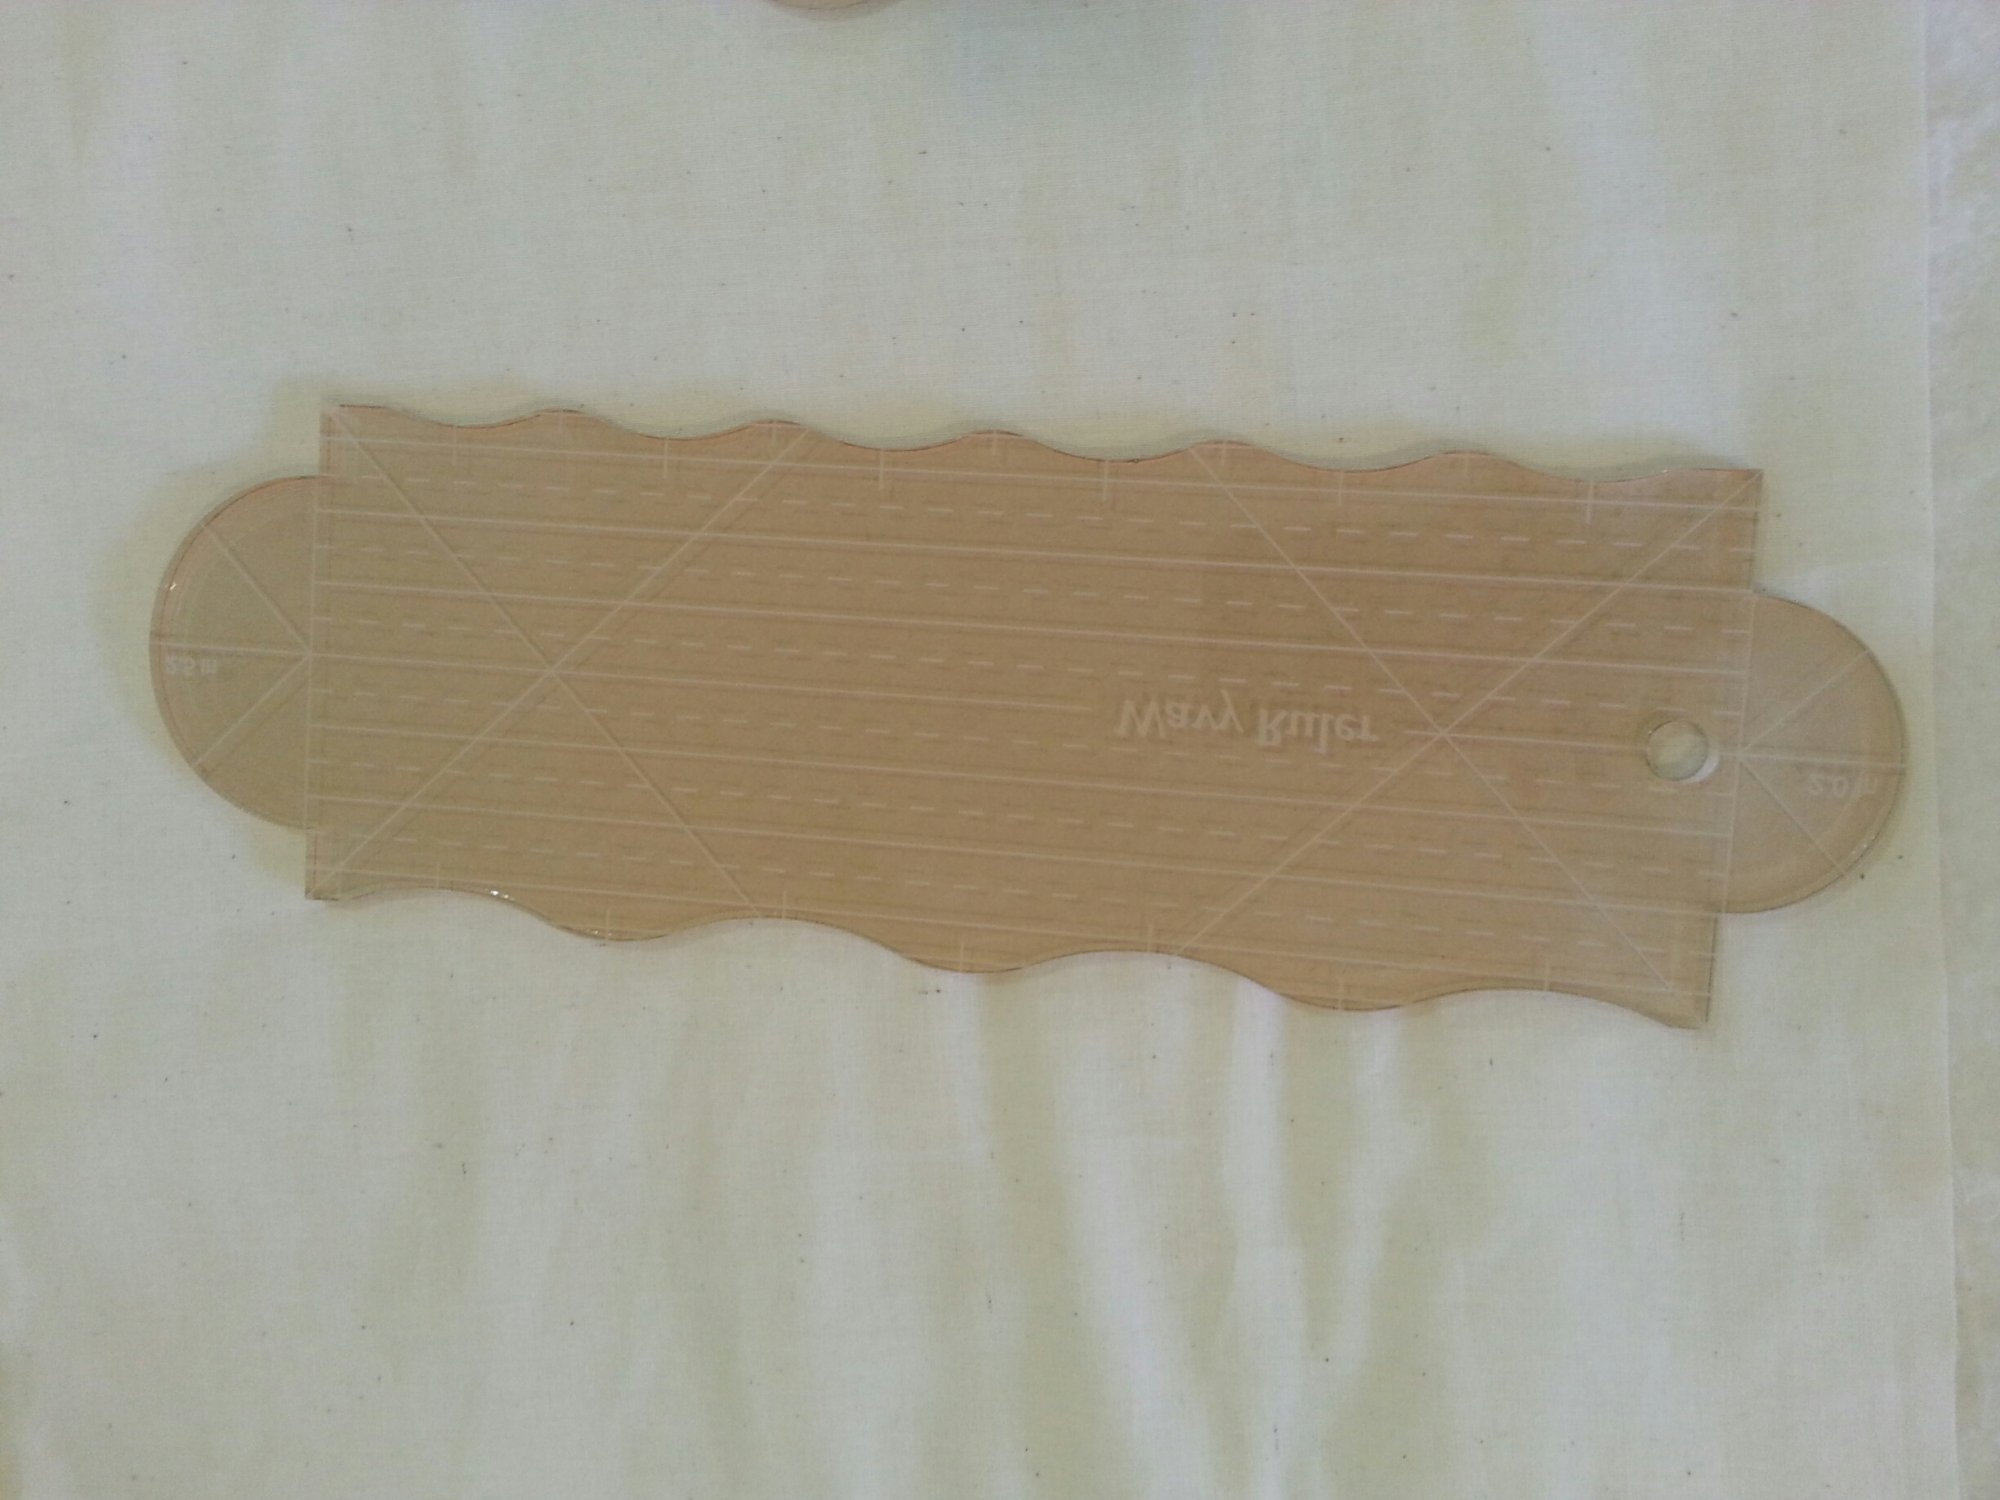 Wavy Ruler quarter inch lines